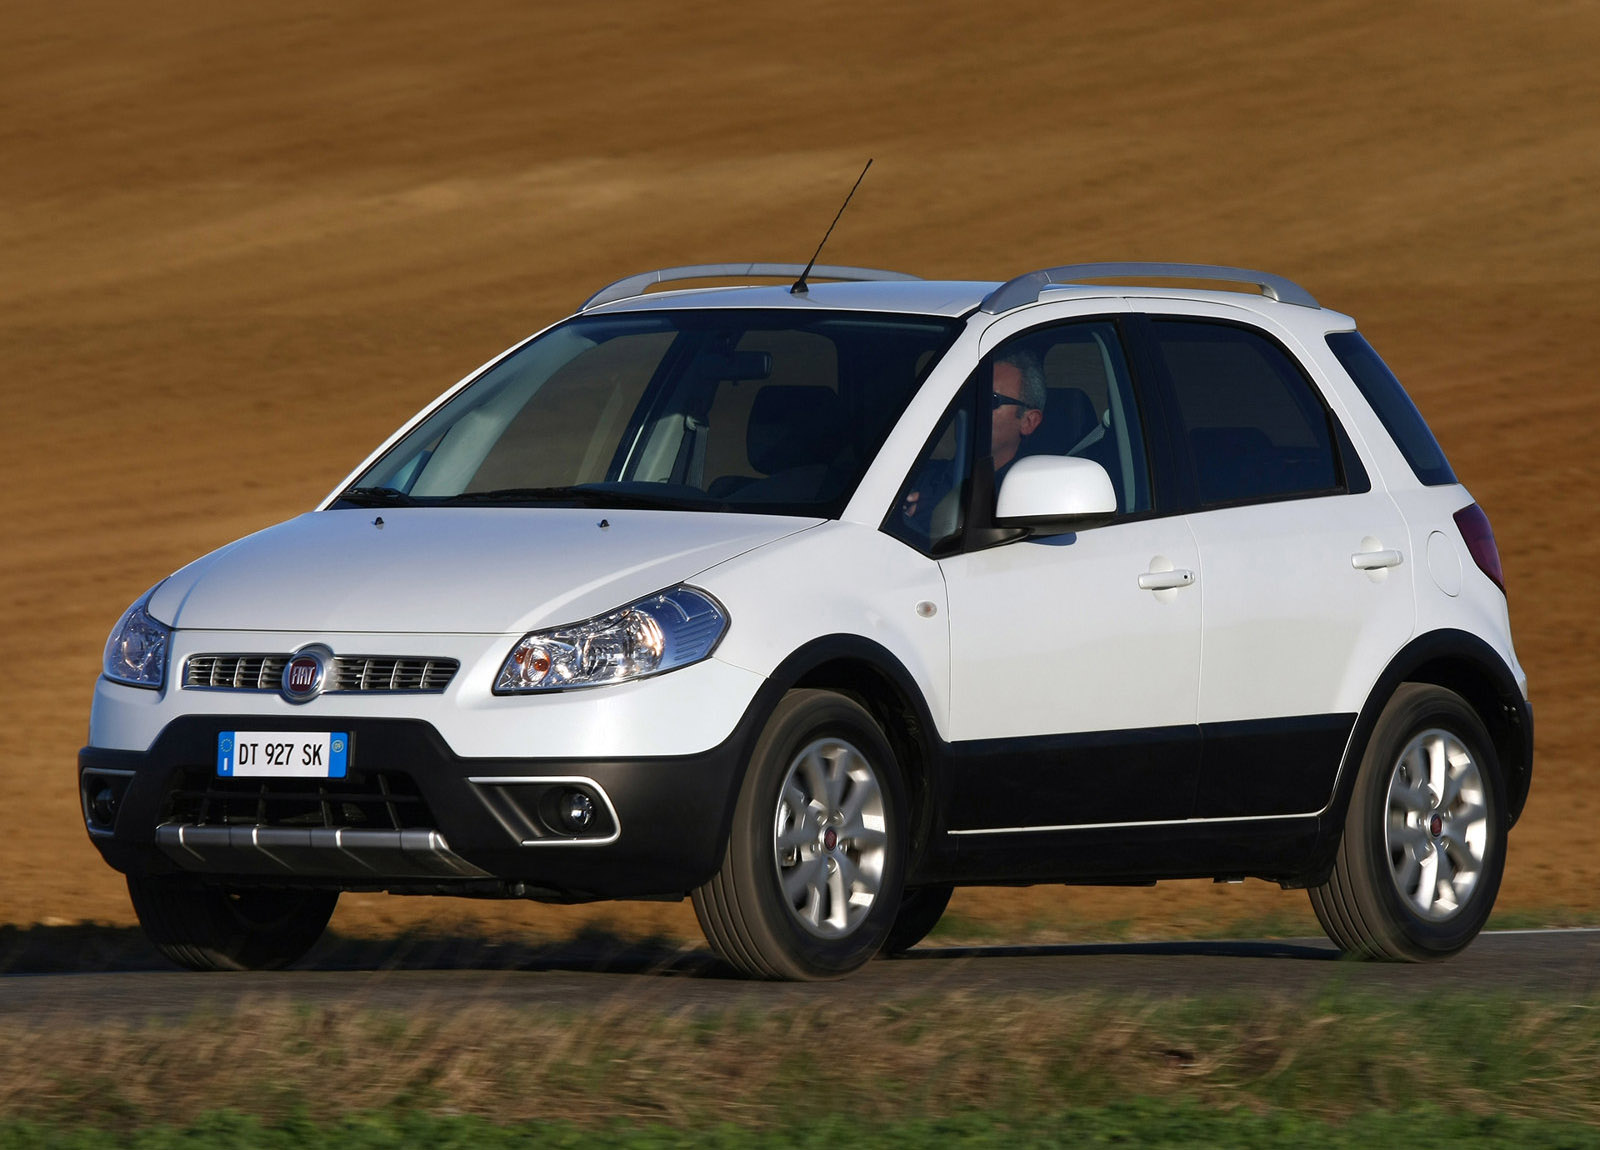 2010 Fiat Sedici Hd Pictures Carsinvasion Com